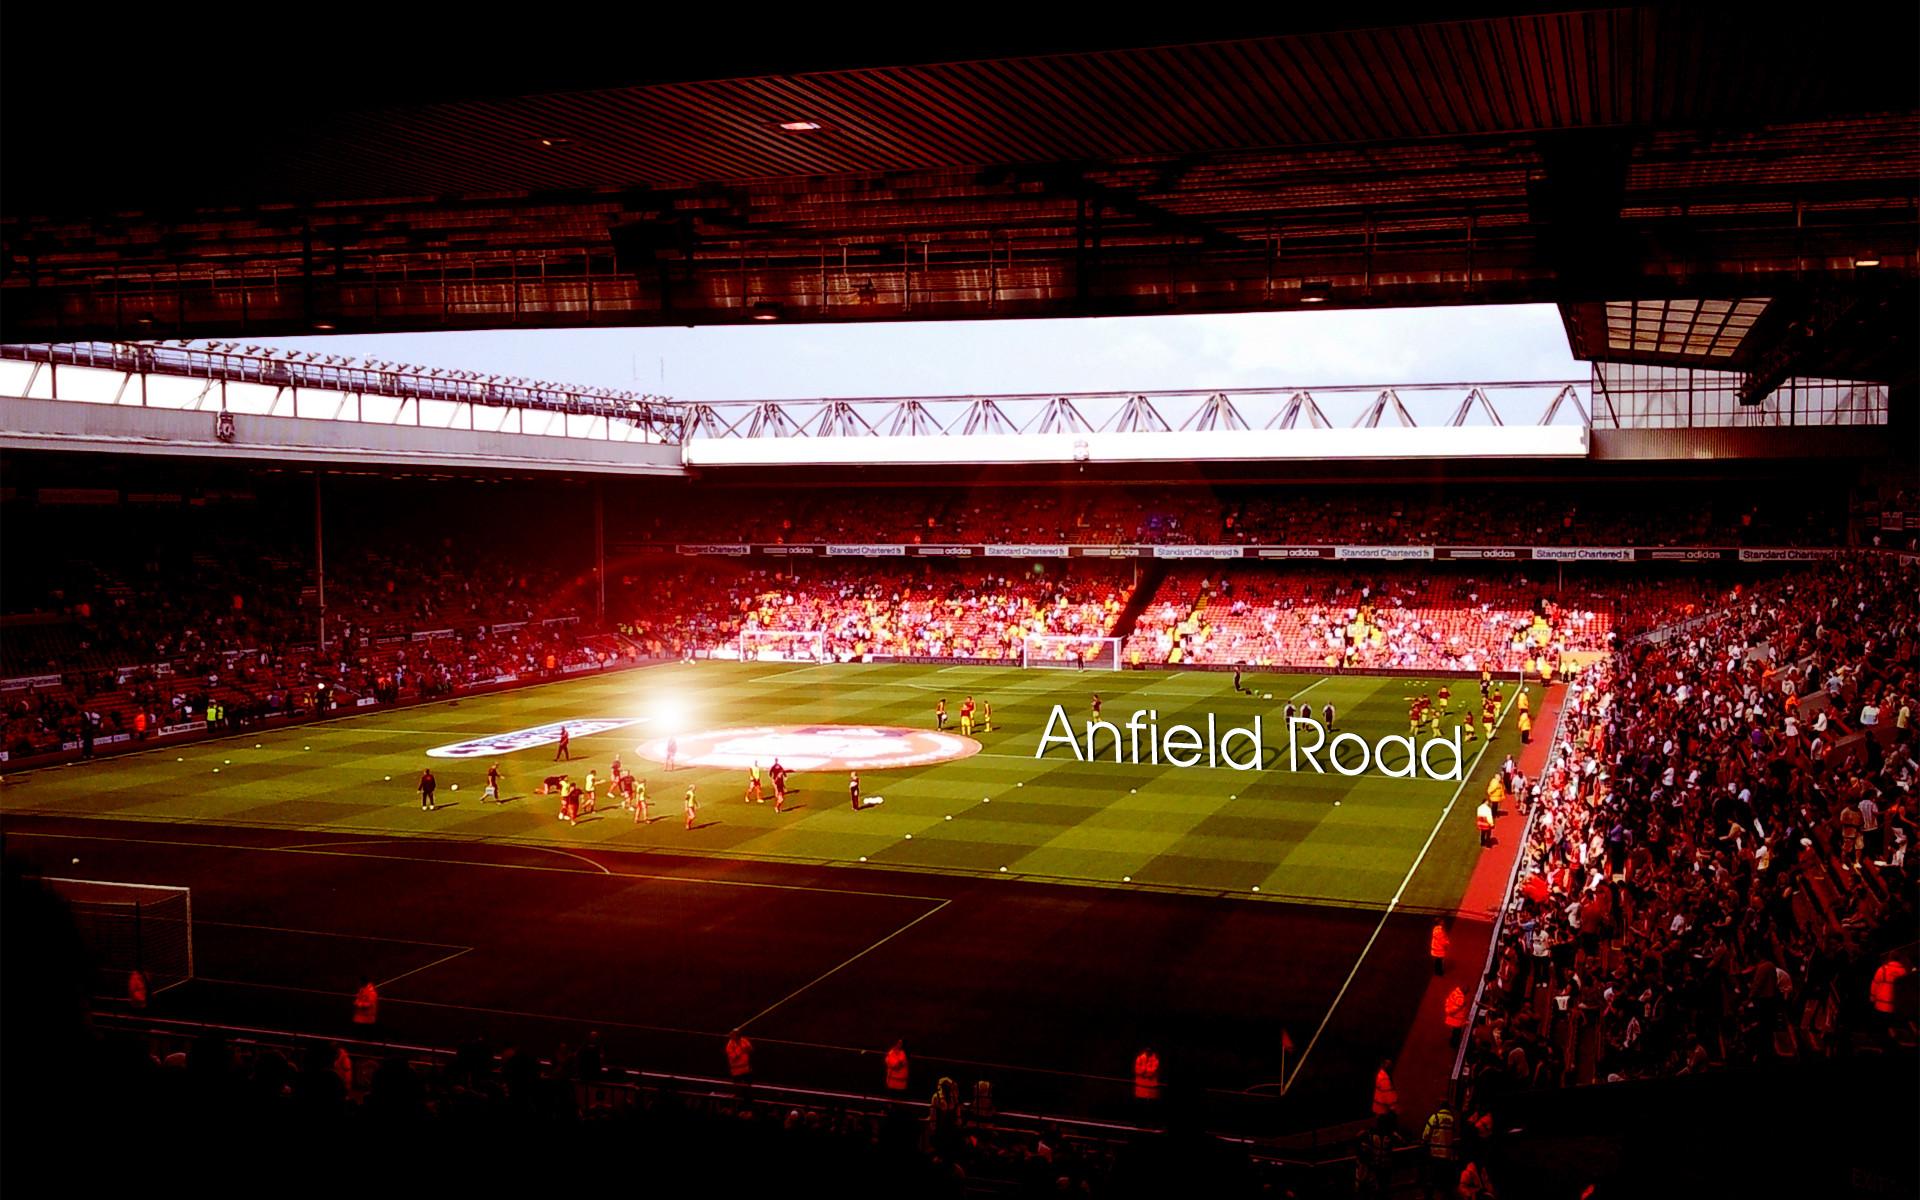 anfield-stadium-liverpool-england-hd-widescreen-wallpapers